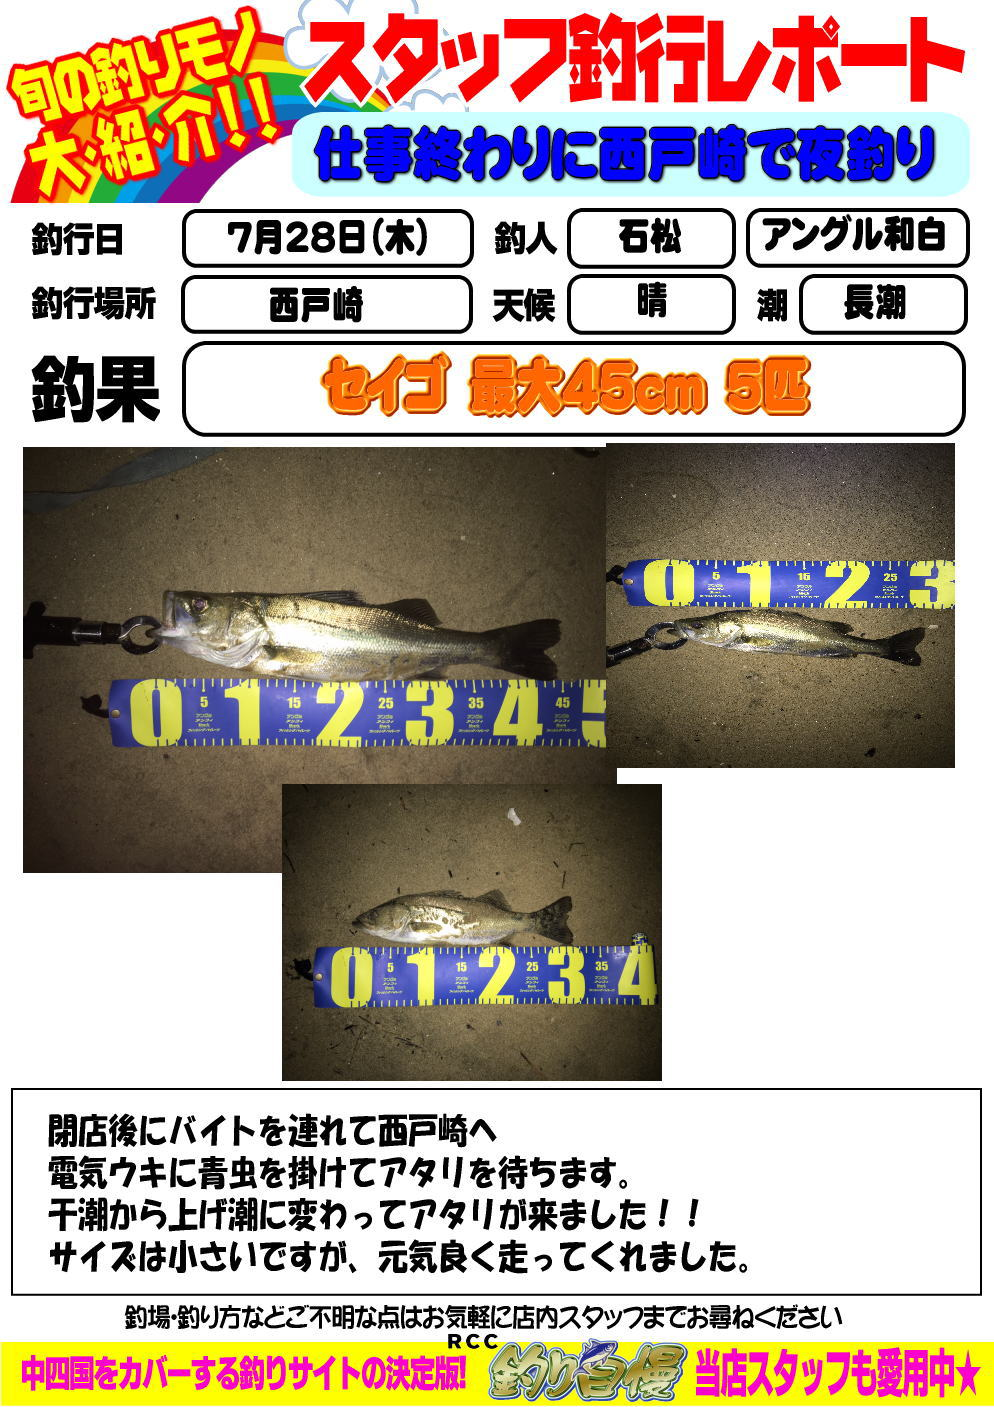 http://www.e-angle.co.jp/shop/blog/image.jpg%E3%80%80%E8%A5%BF%E6%88%B8%E5%B4%8E%E3%82%B7%E3%83%BC%E3%83%90%E3%82%B9.jpg